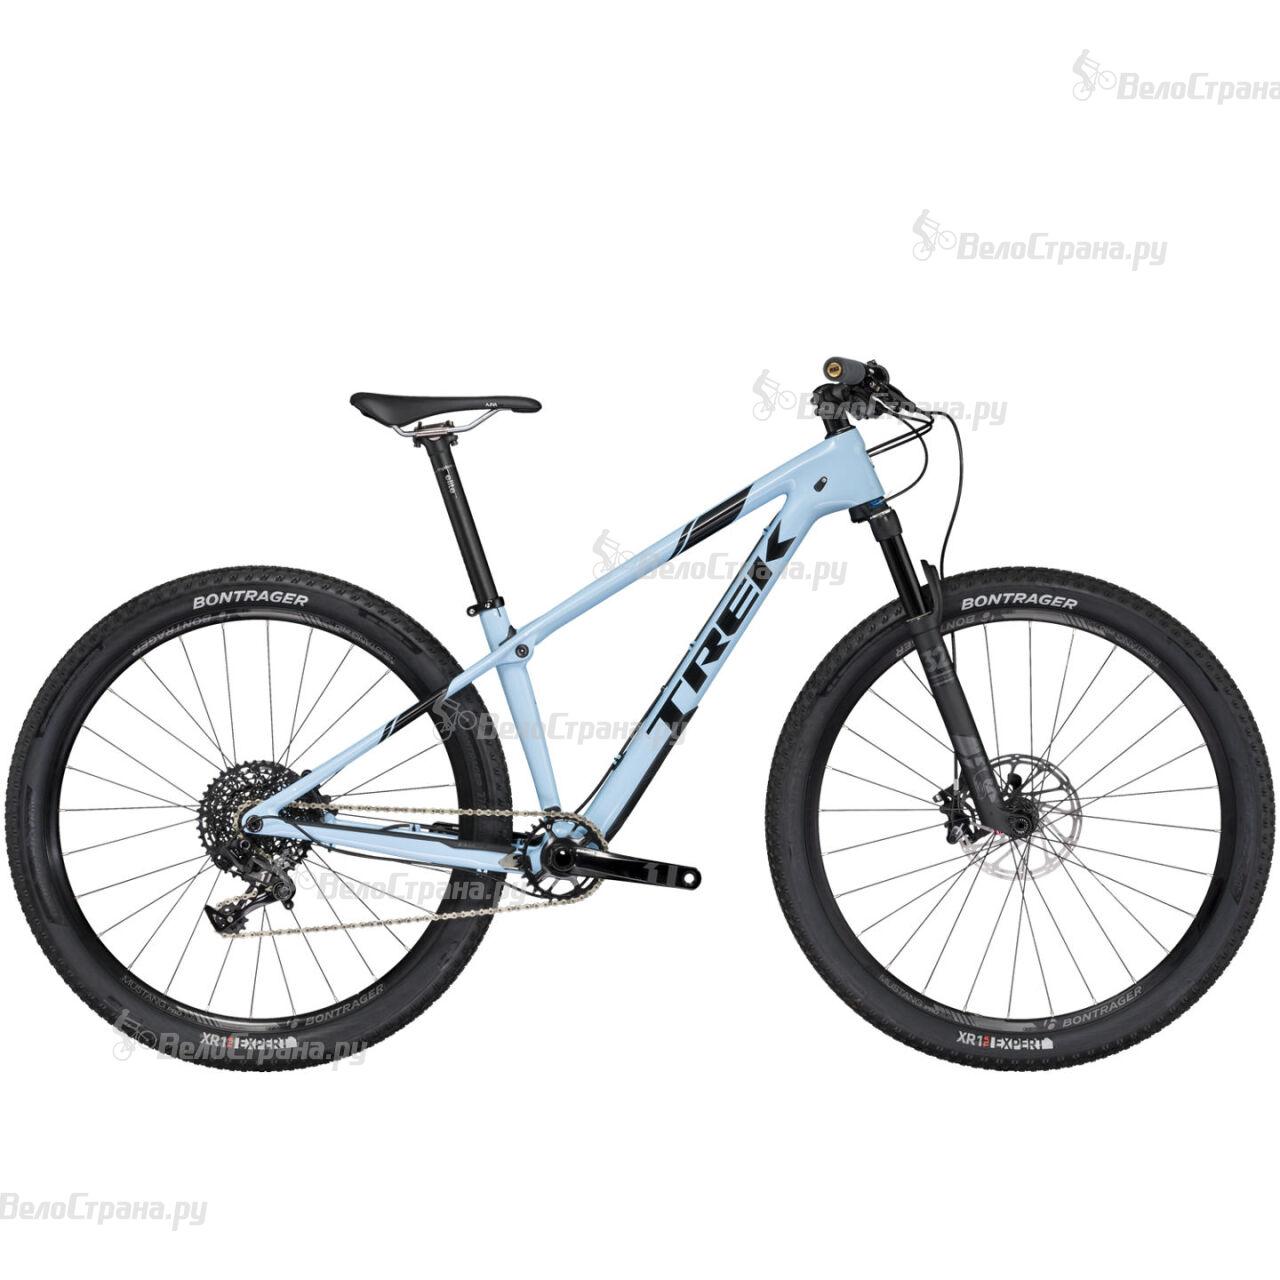 Велосипед Trek Procal 9.7 WSD (2017) велосипед trek madone 3 1 wsd 2013